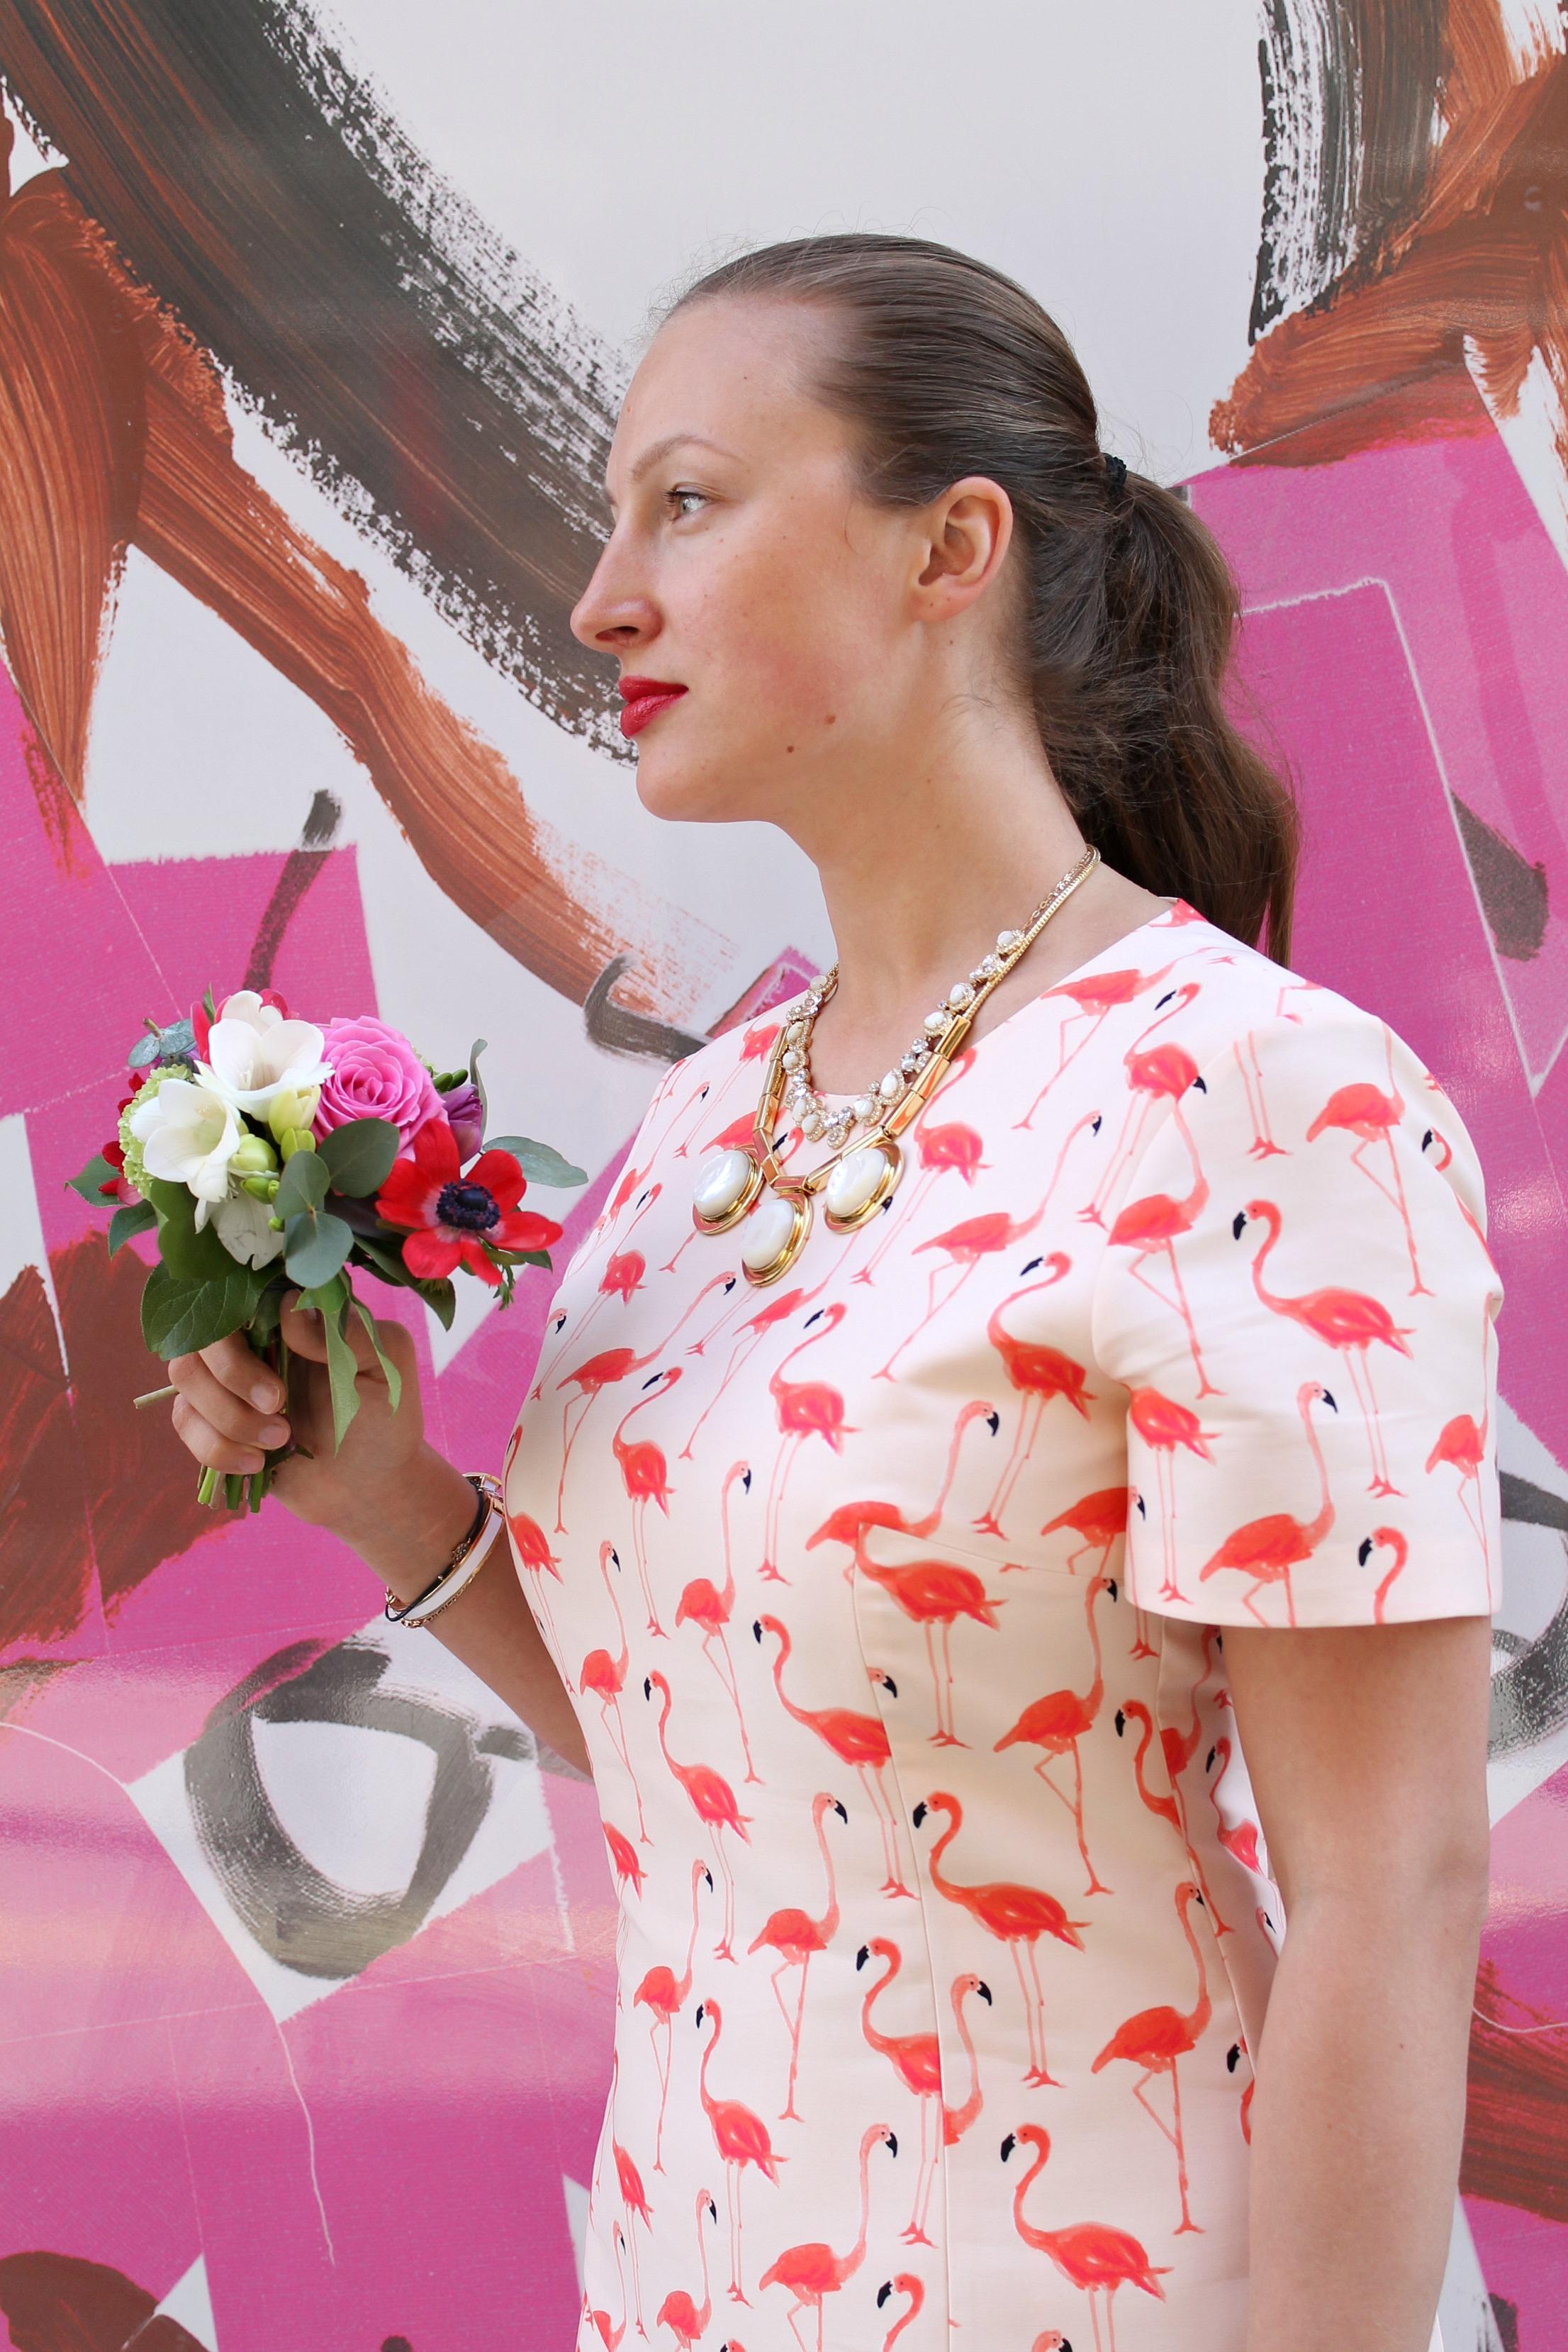 Kate-Spade-Flamingo-sheath-dress-photo-by-Little-Big-Bell